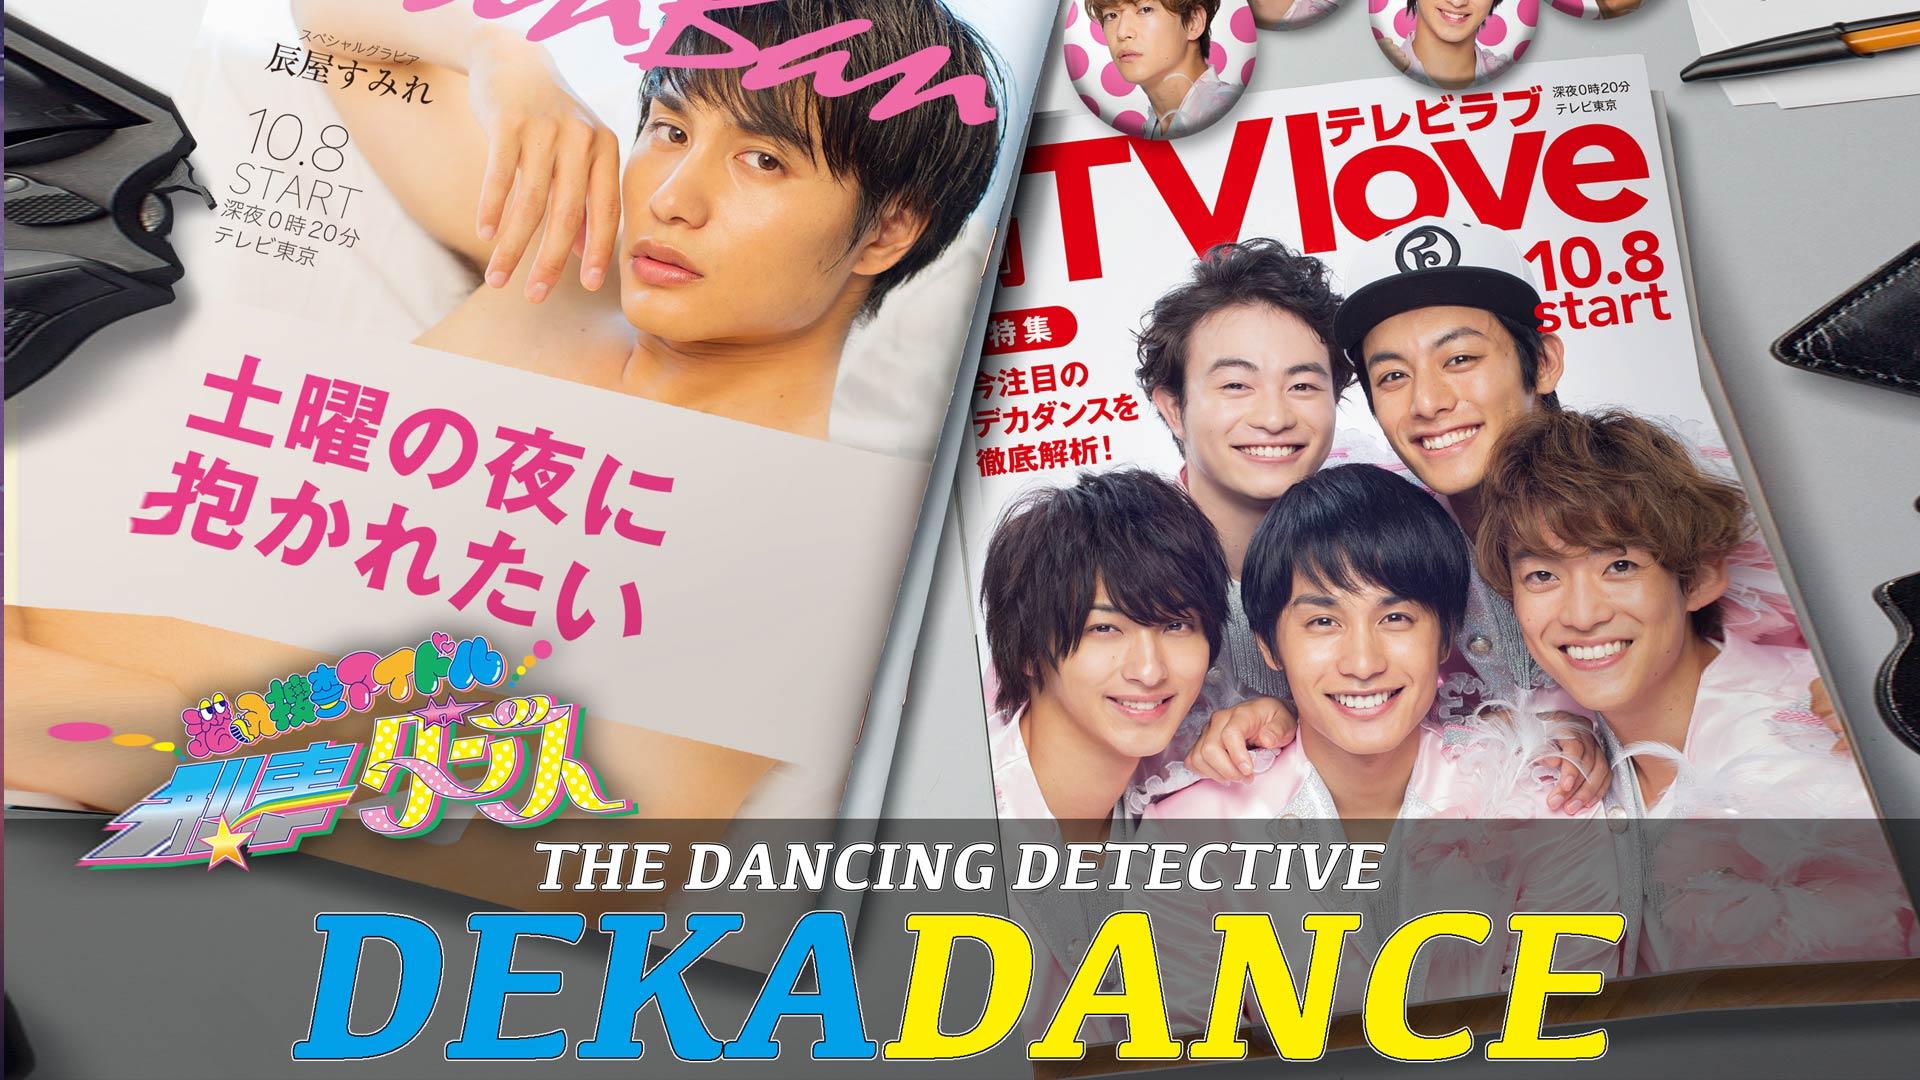 The Dancing Detective Dekadance - Season 1